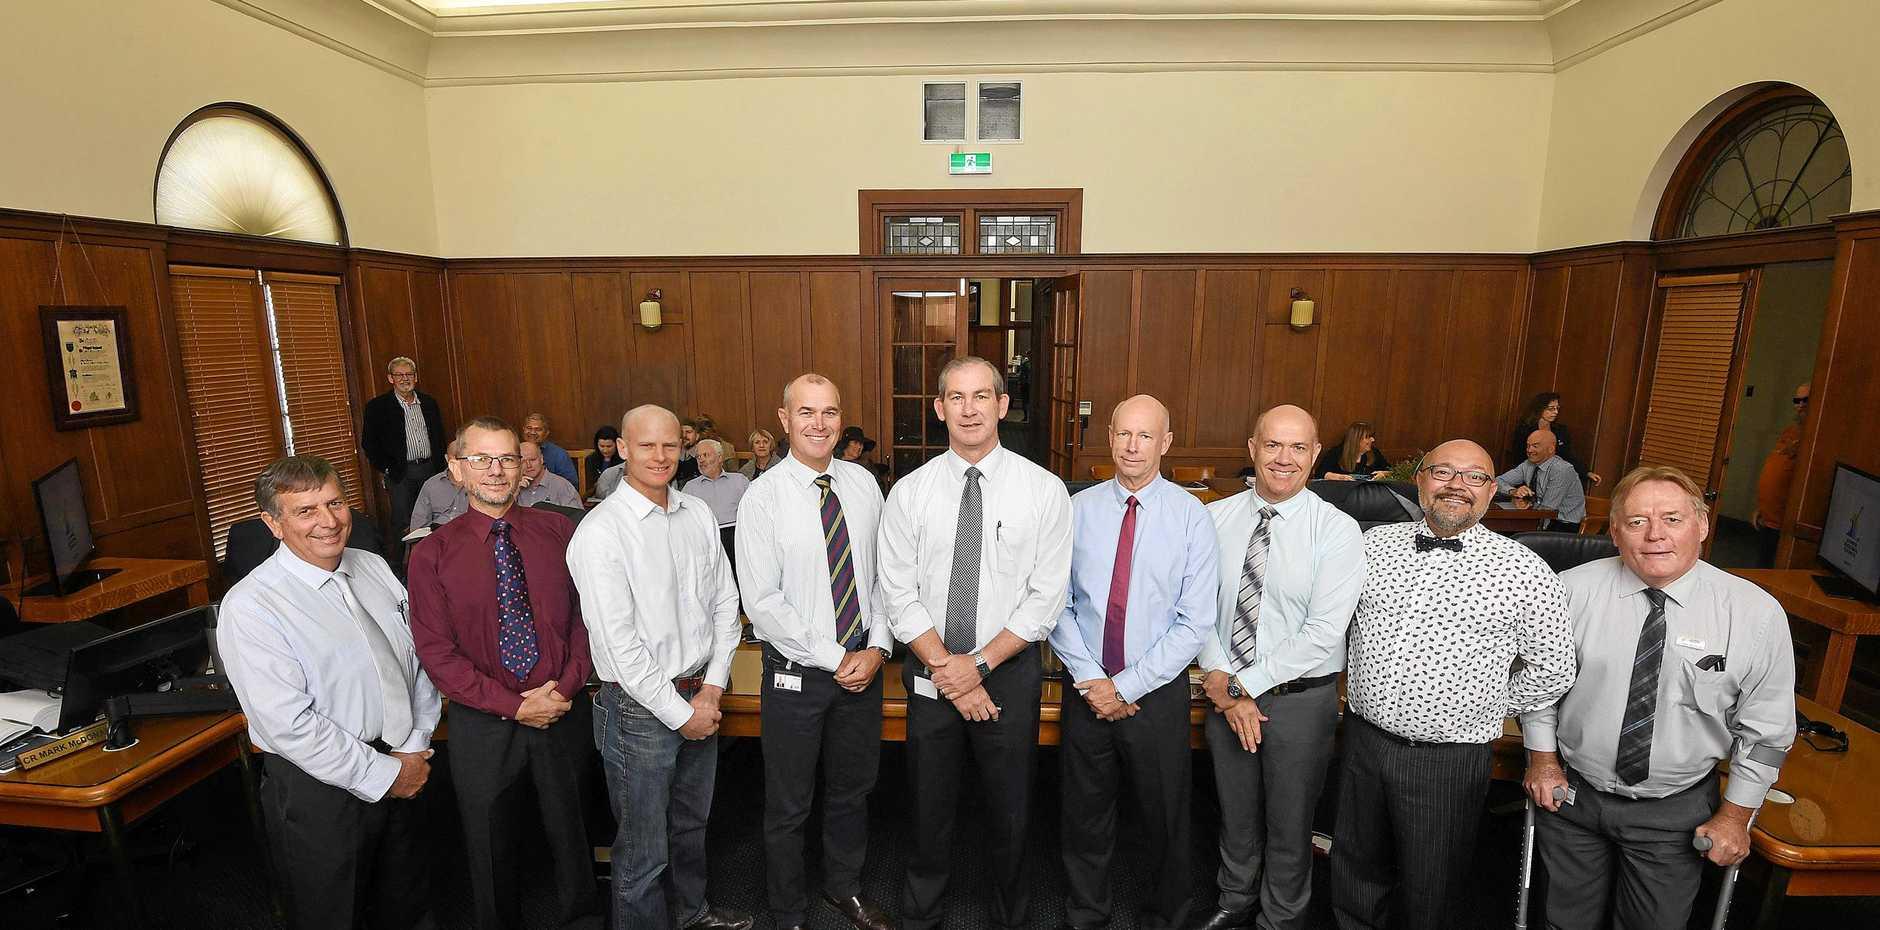 The all male Gympie council Hilary Smerdon, Dan Stewart, Glen Hartwig, Bob Leitch, Mick Curran, Bob Fredman, Mal Gear, Daryl Dodt and Mark McDonald.